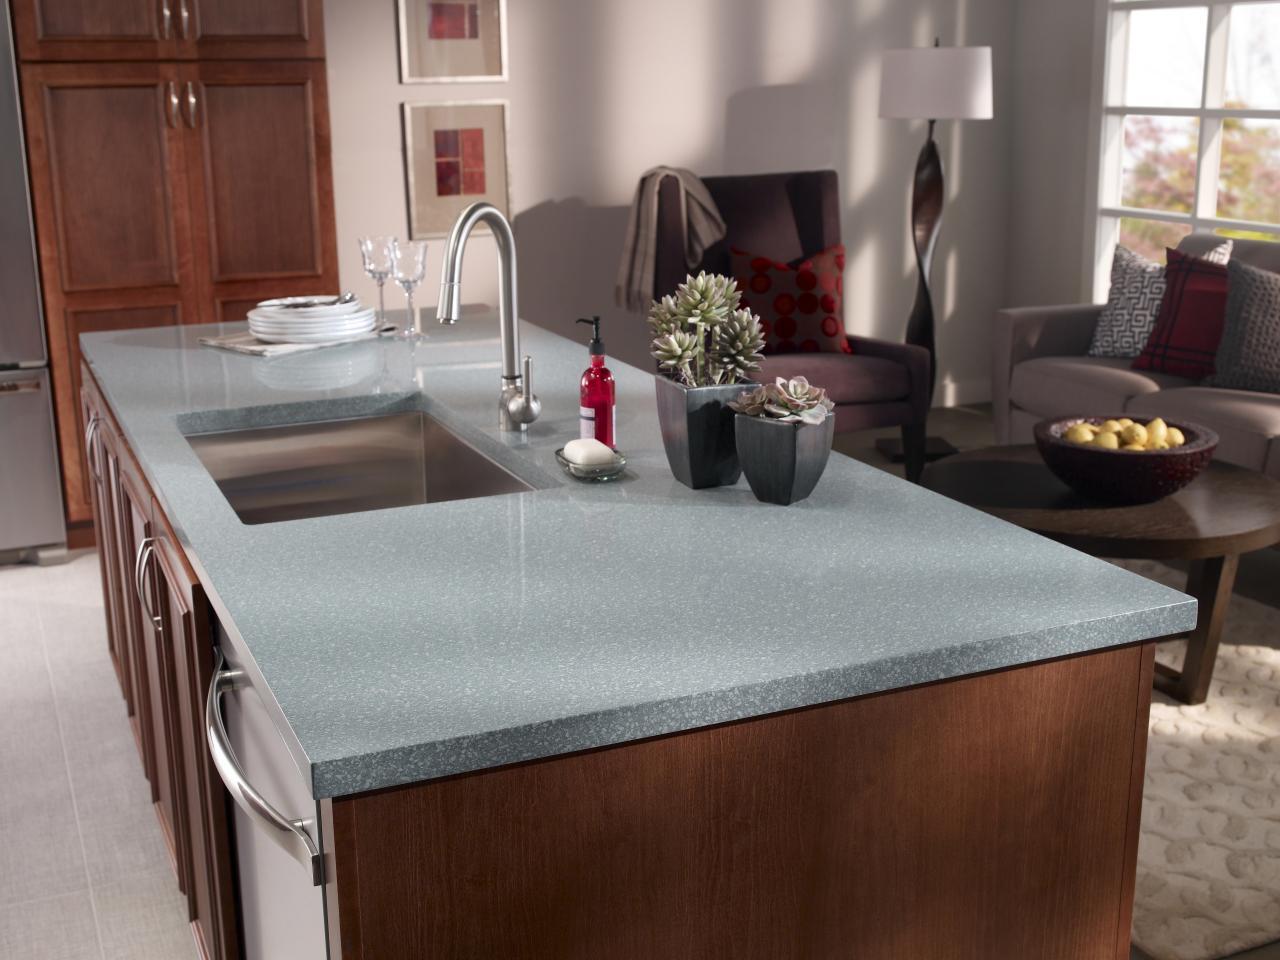 Uncategorized Corian Kitchen Countertops corian kitchen countertops hgtv countertops